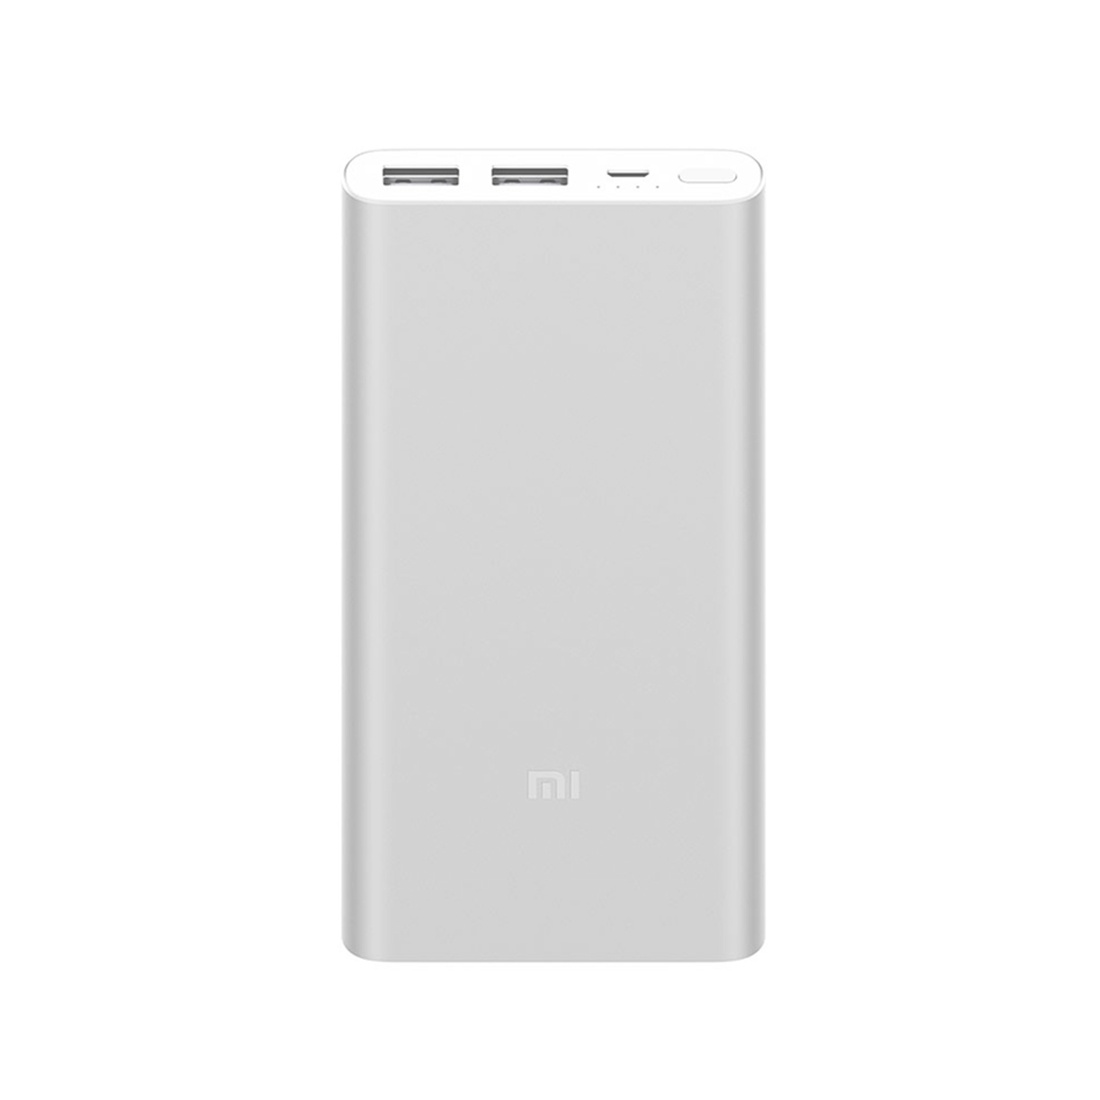 Зарядное устройство Xiaomi Power Bank 10000 мАч, серебристый